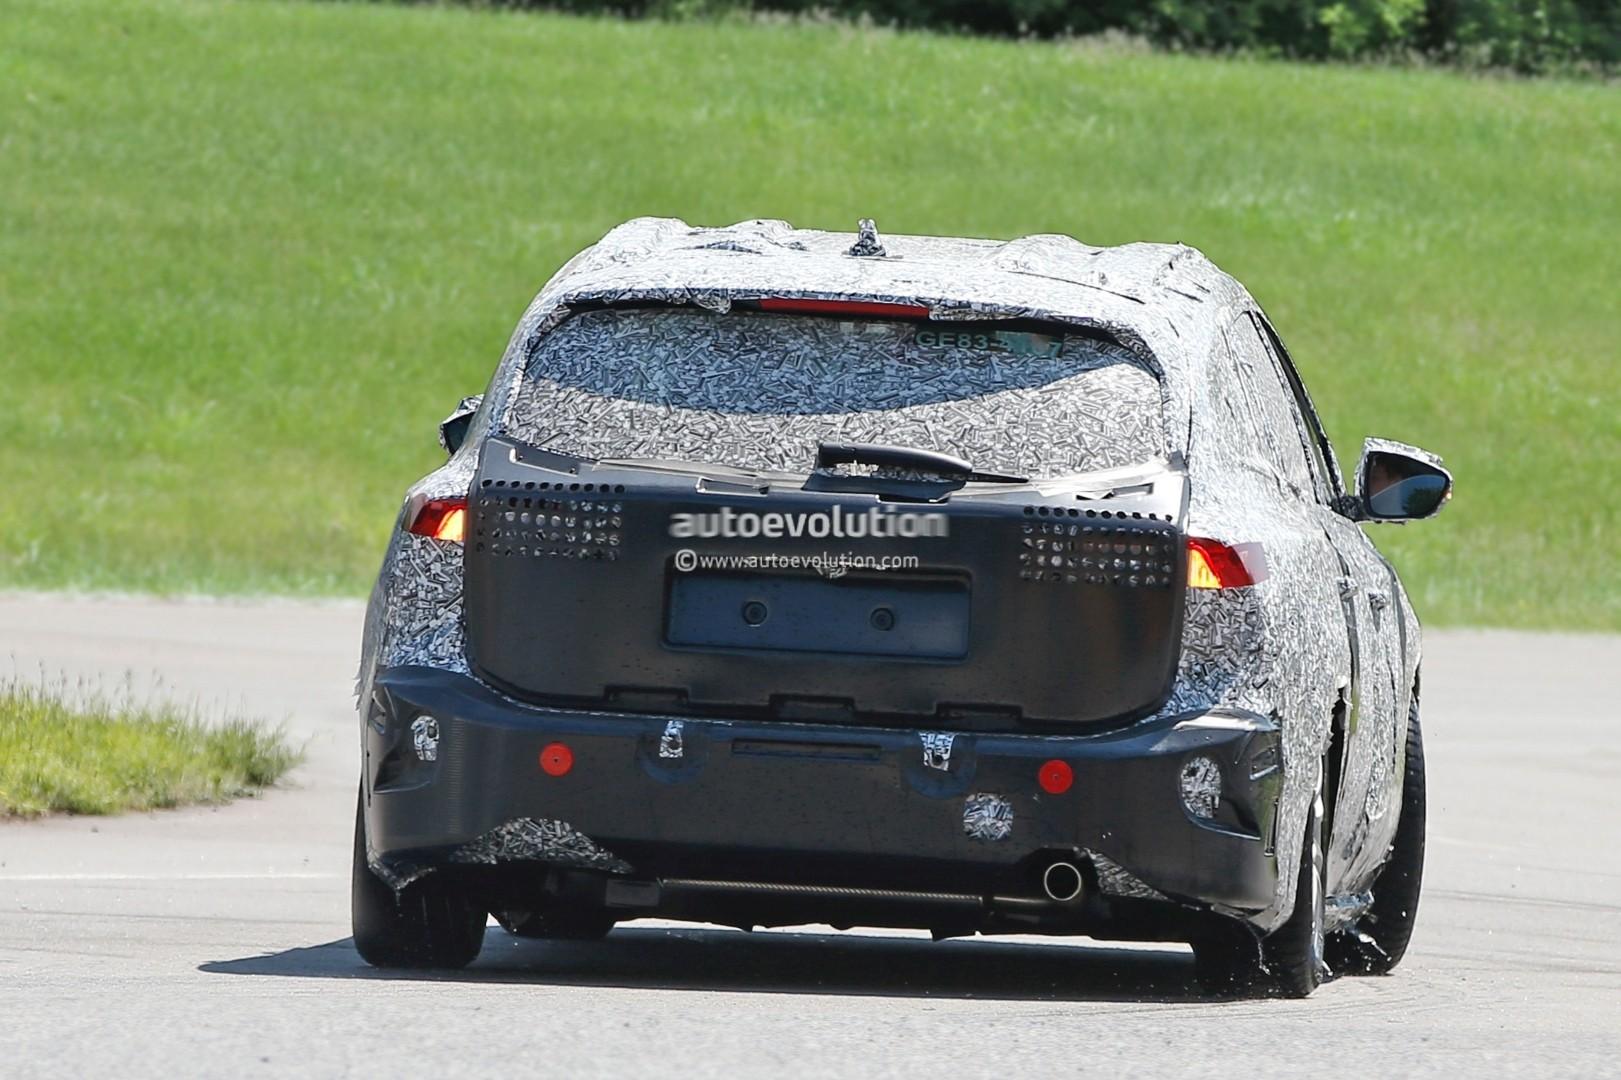 spyshots-2019-ford-focus-wagon-prototype-reveals-longer-rear-doors_9